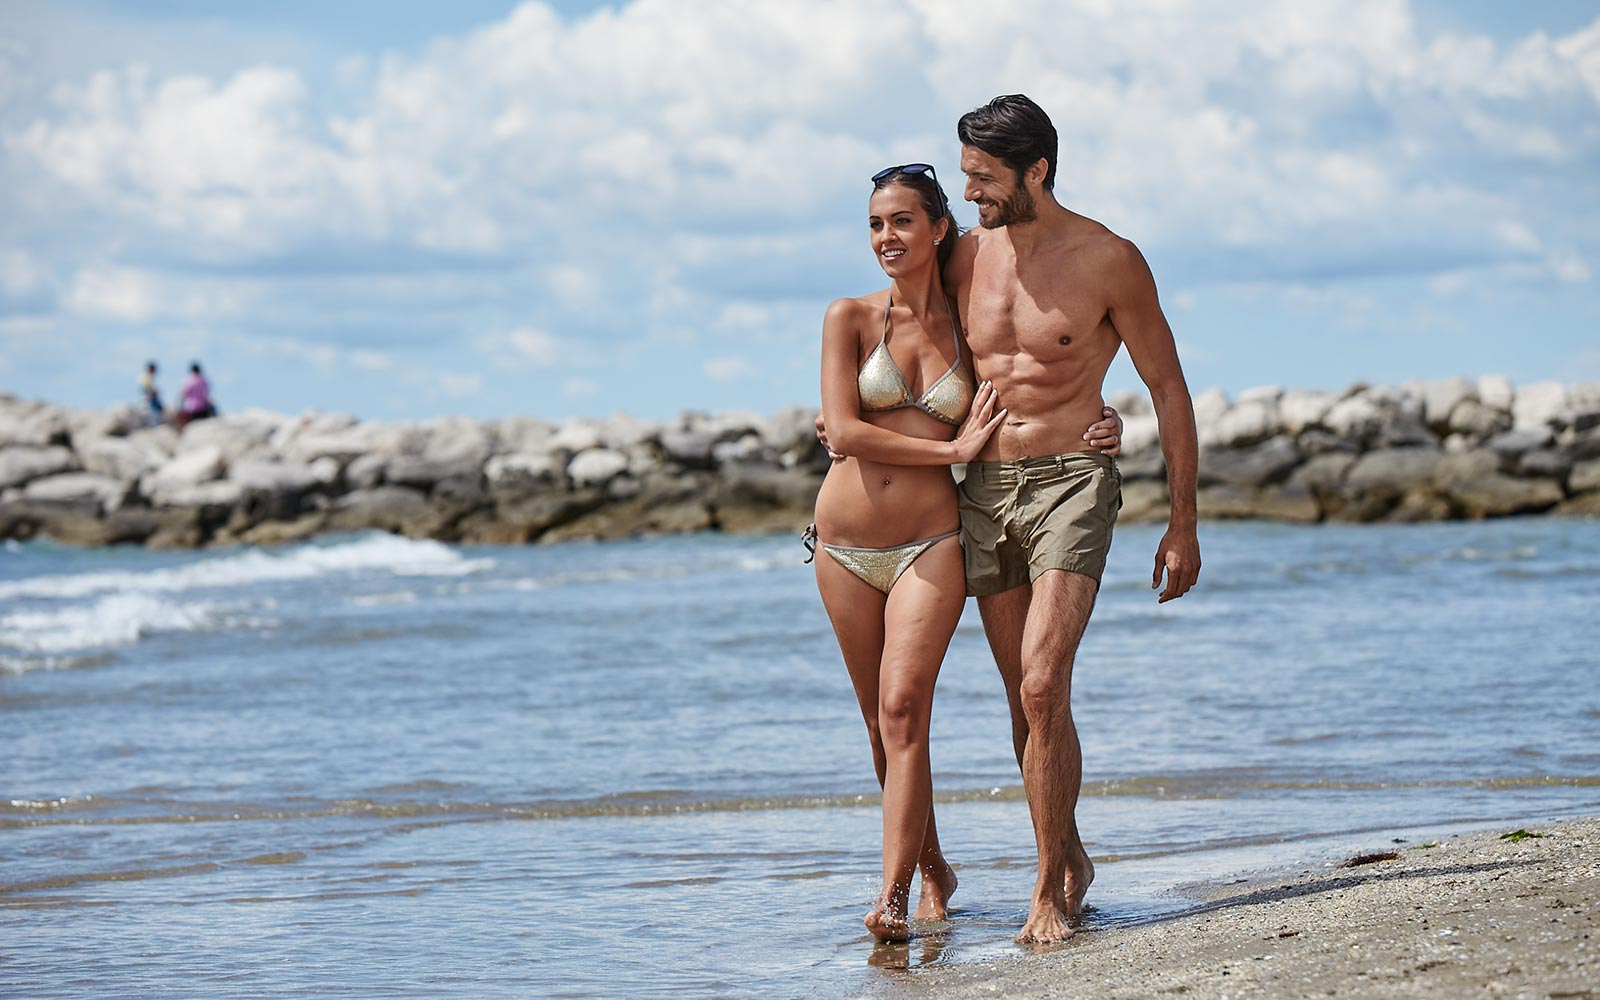 3. Beach Cavallino